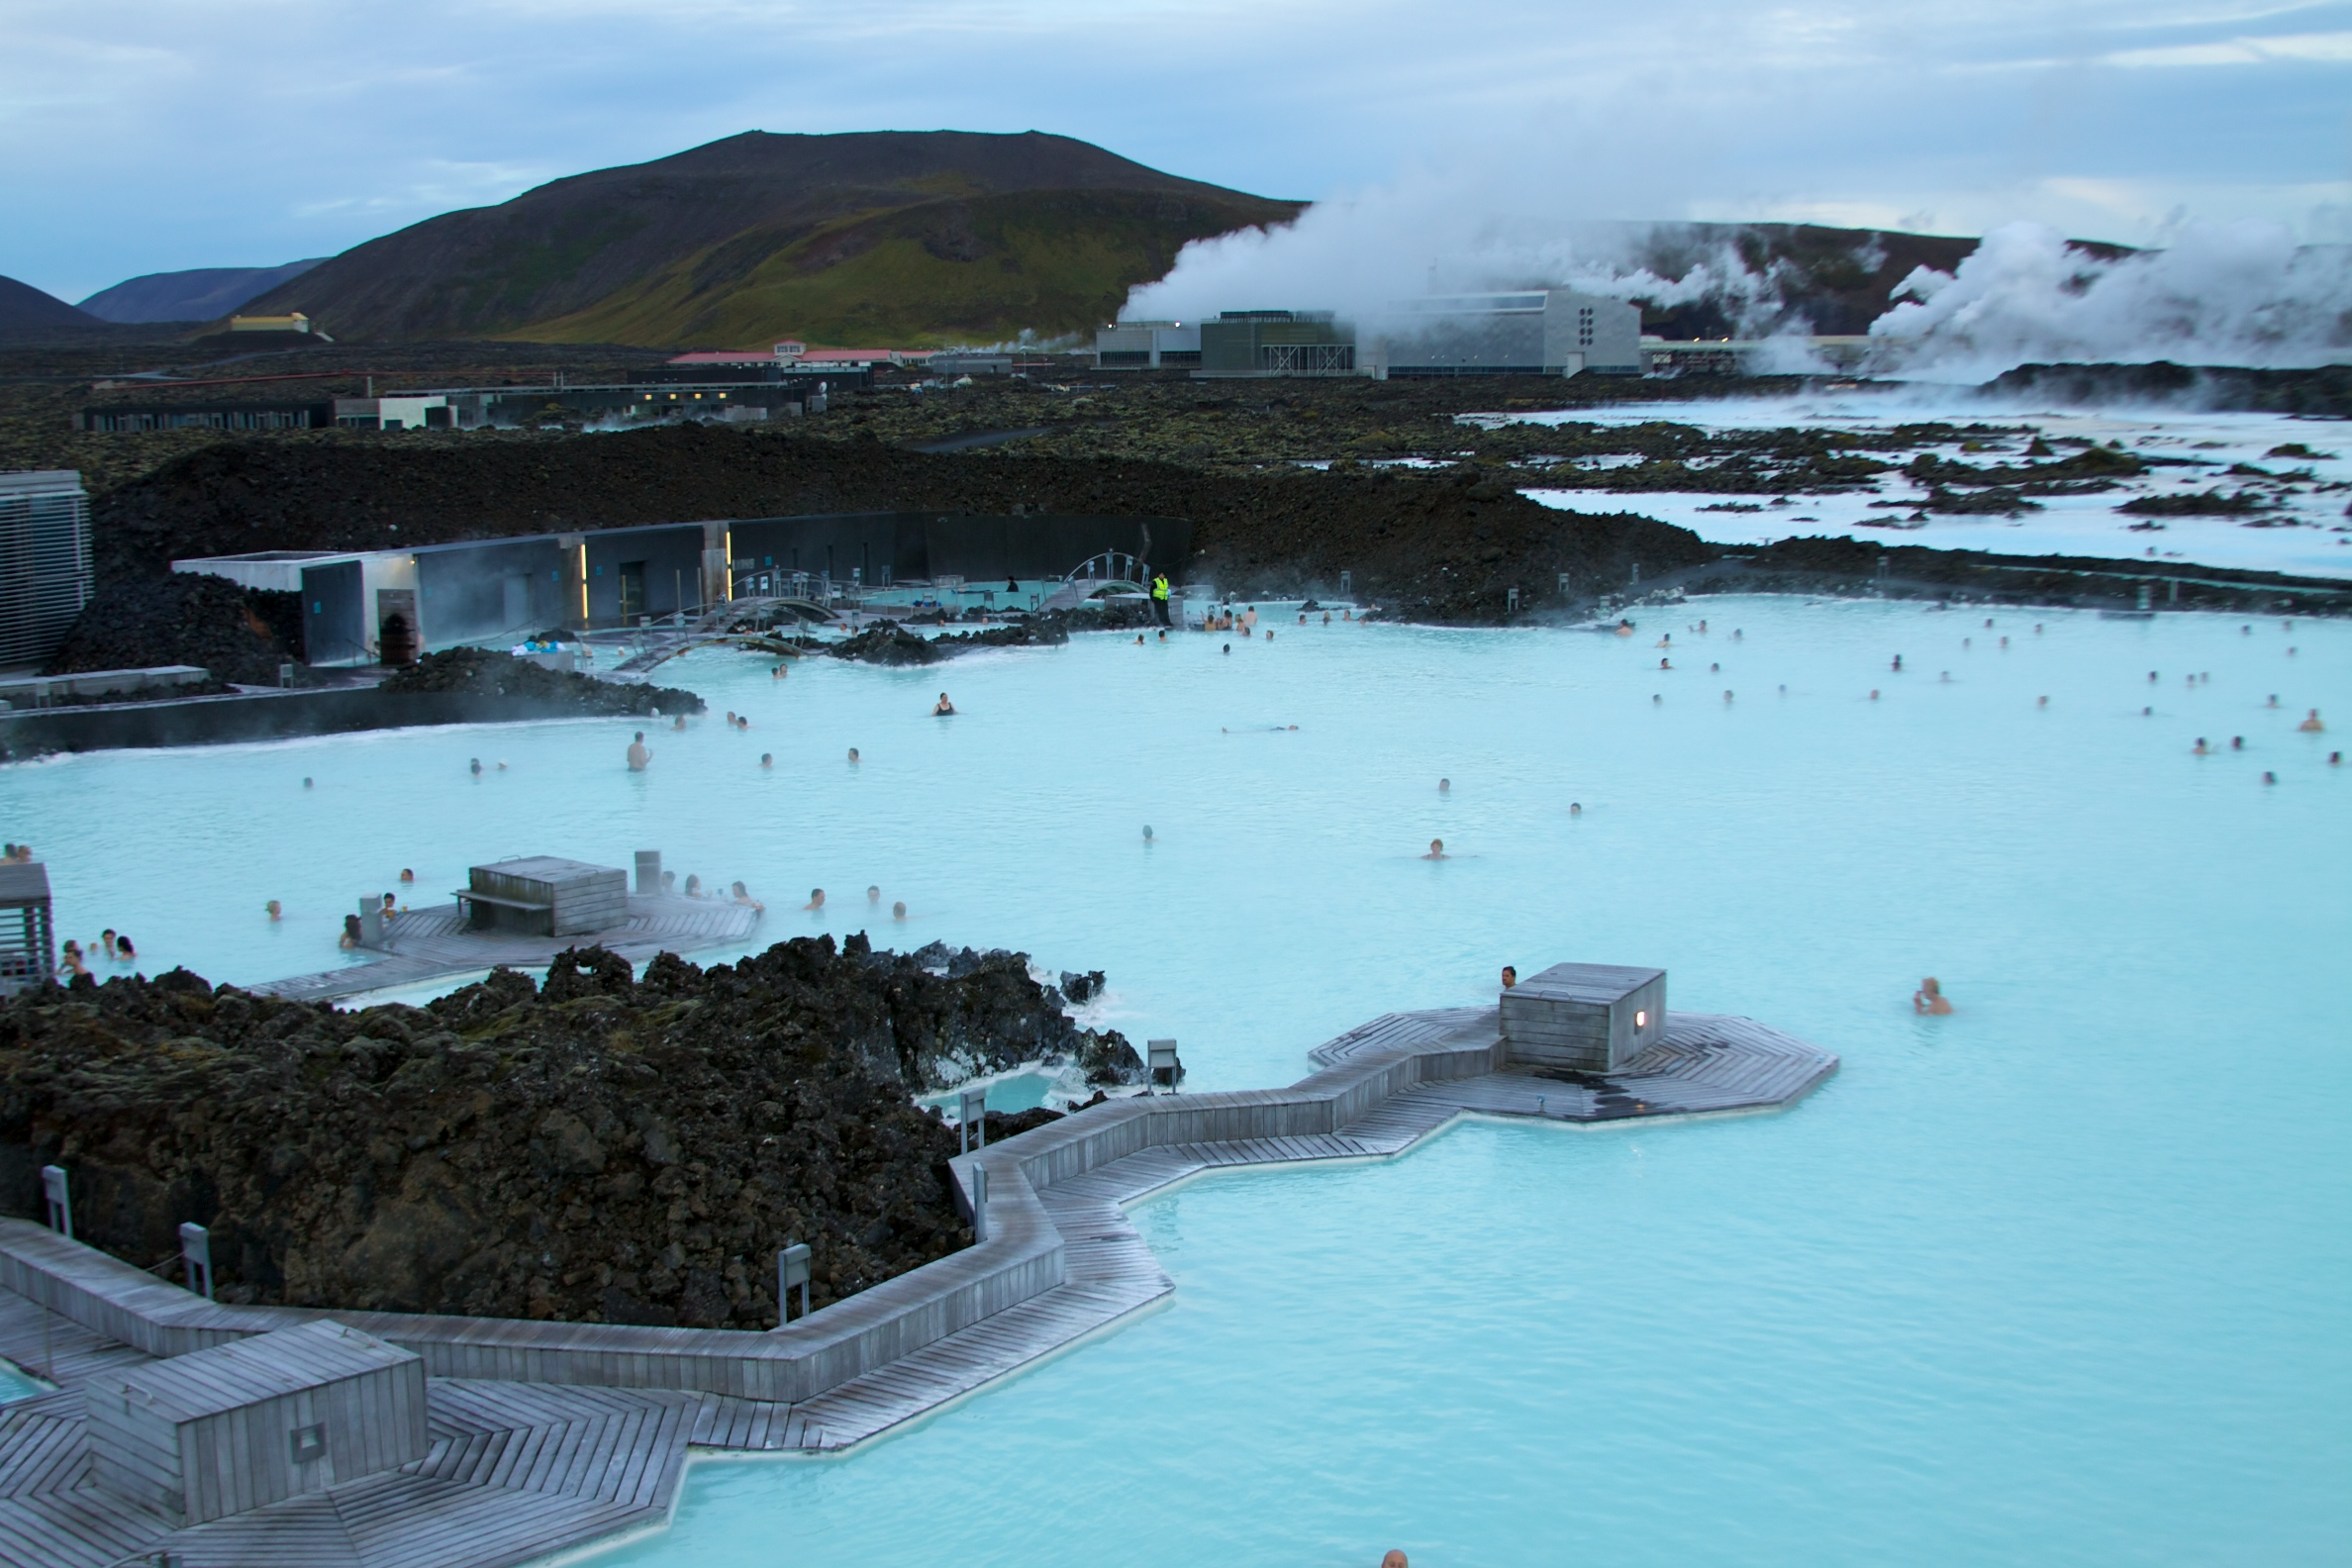 Iceland_-_Blue_Lagoon_09_(6571266721)